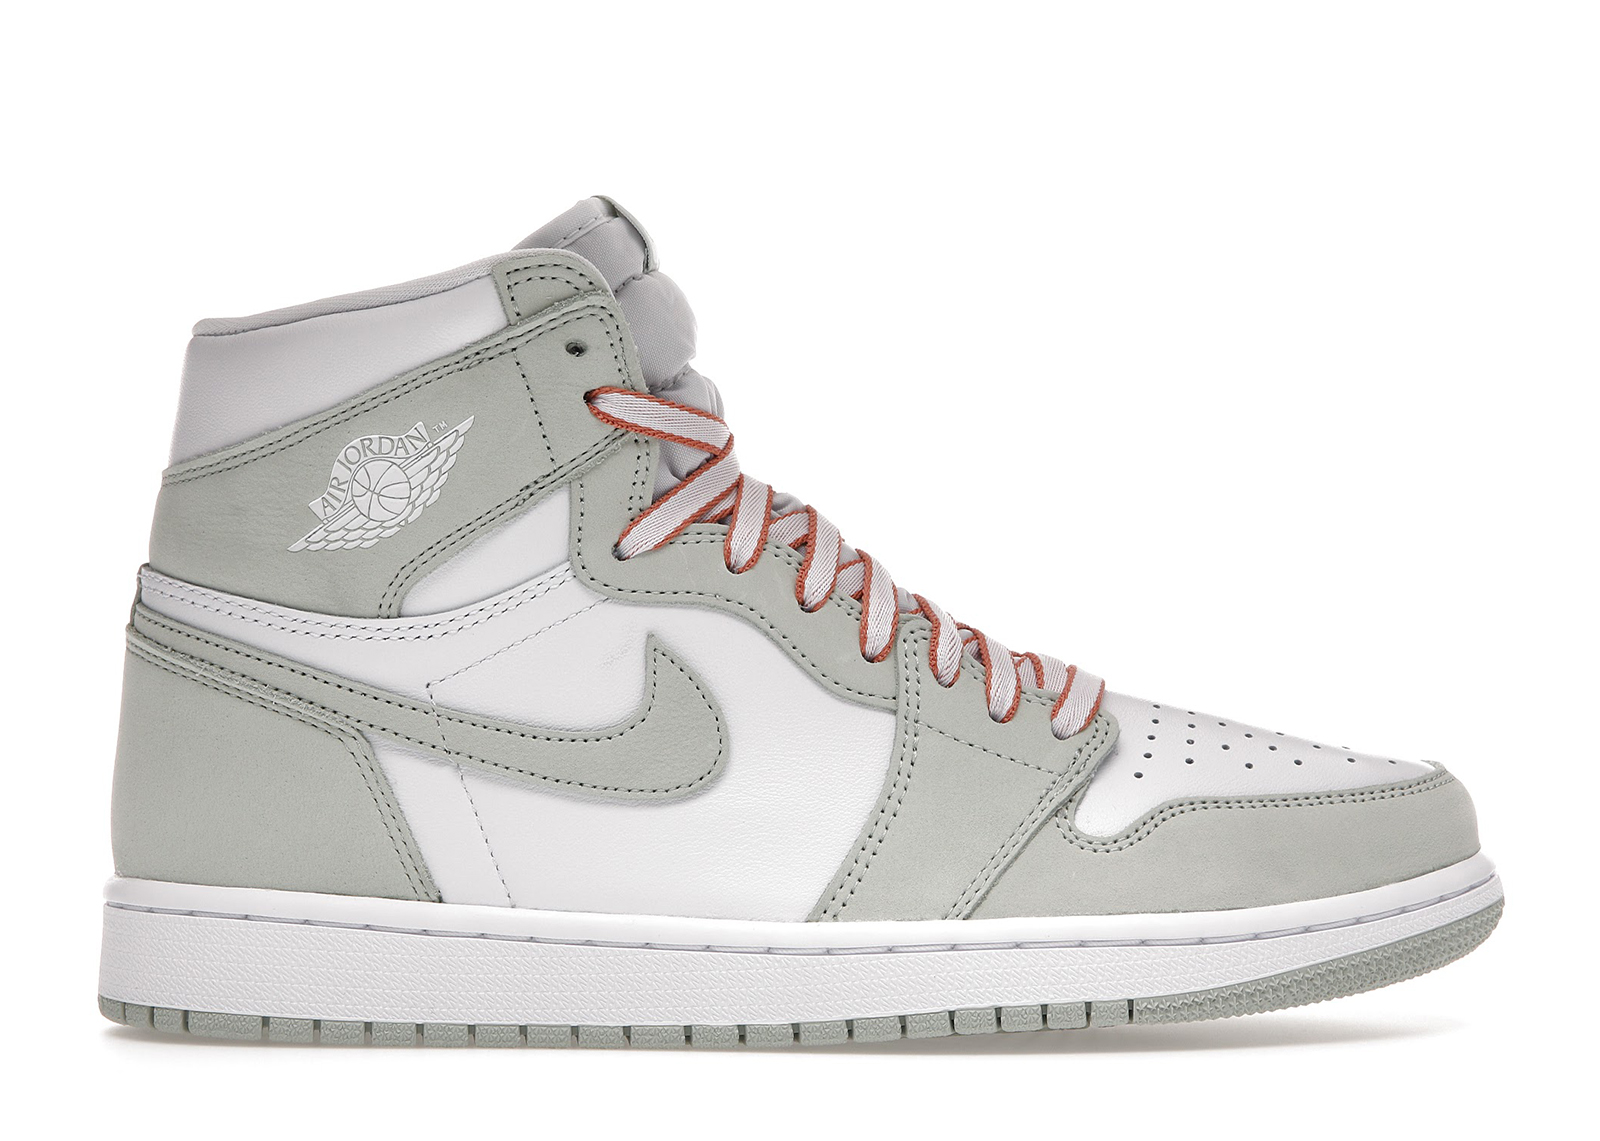 Acheter Air Jordan 1 Chaussures et sneakers neuves